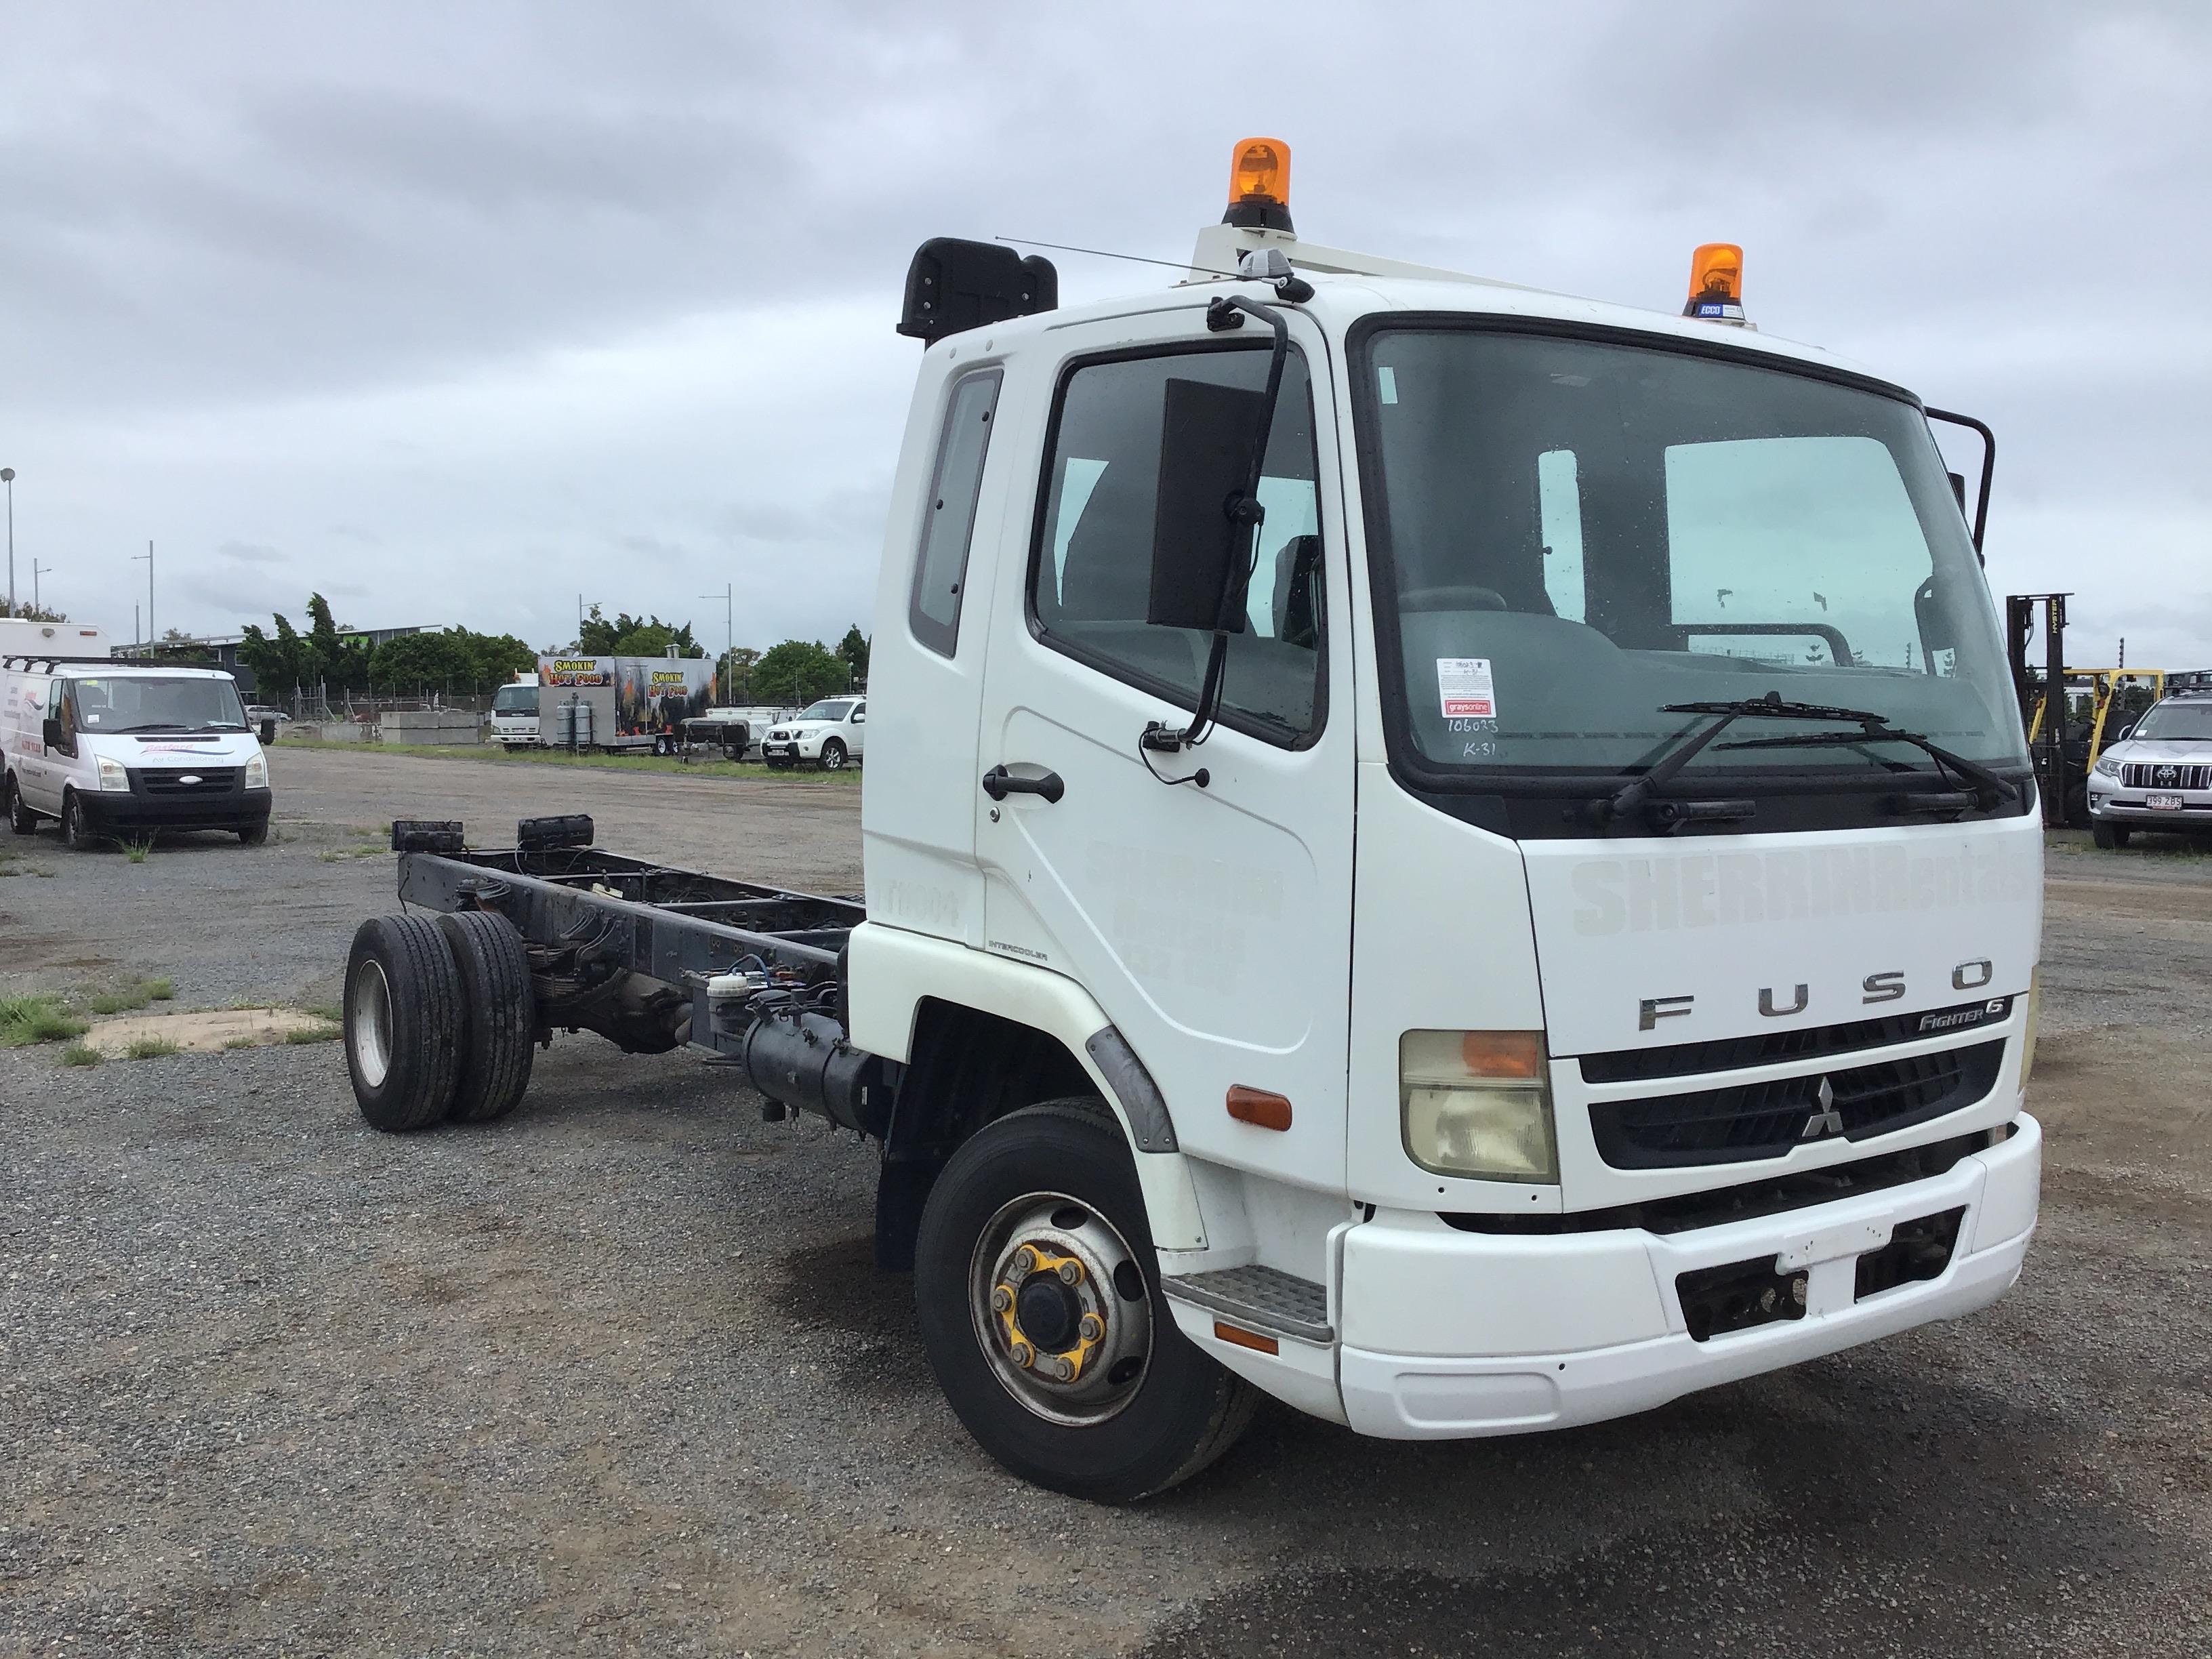 2010 Mitsubishi FK 600 4 x 2 Cab Chassis Truck